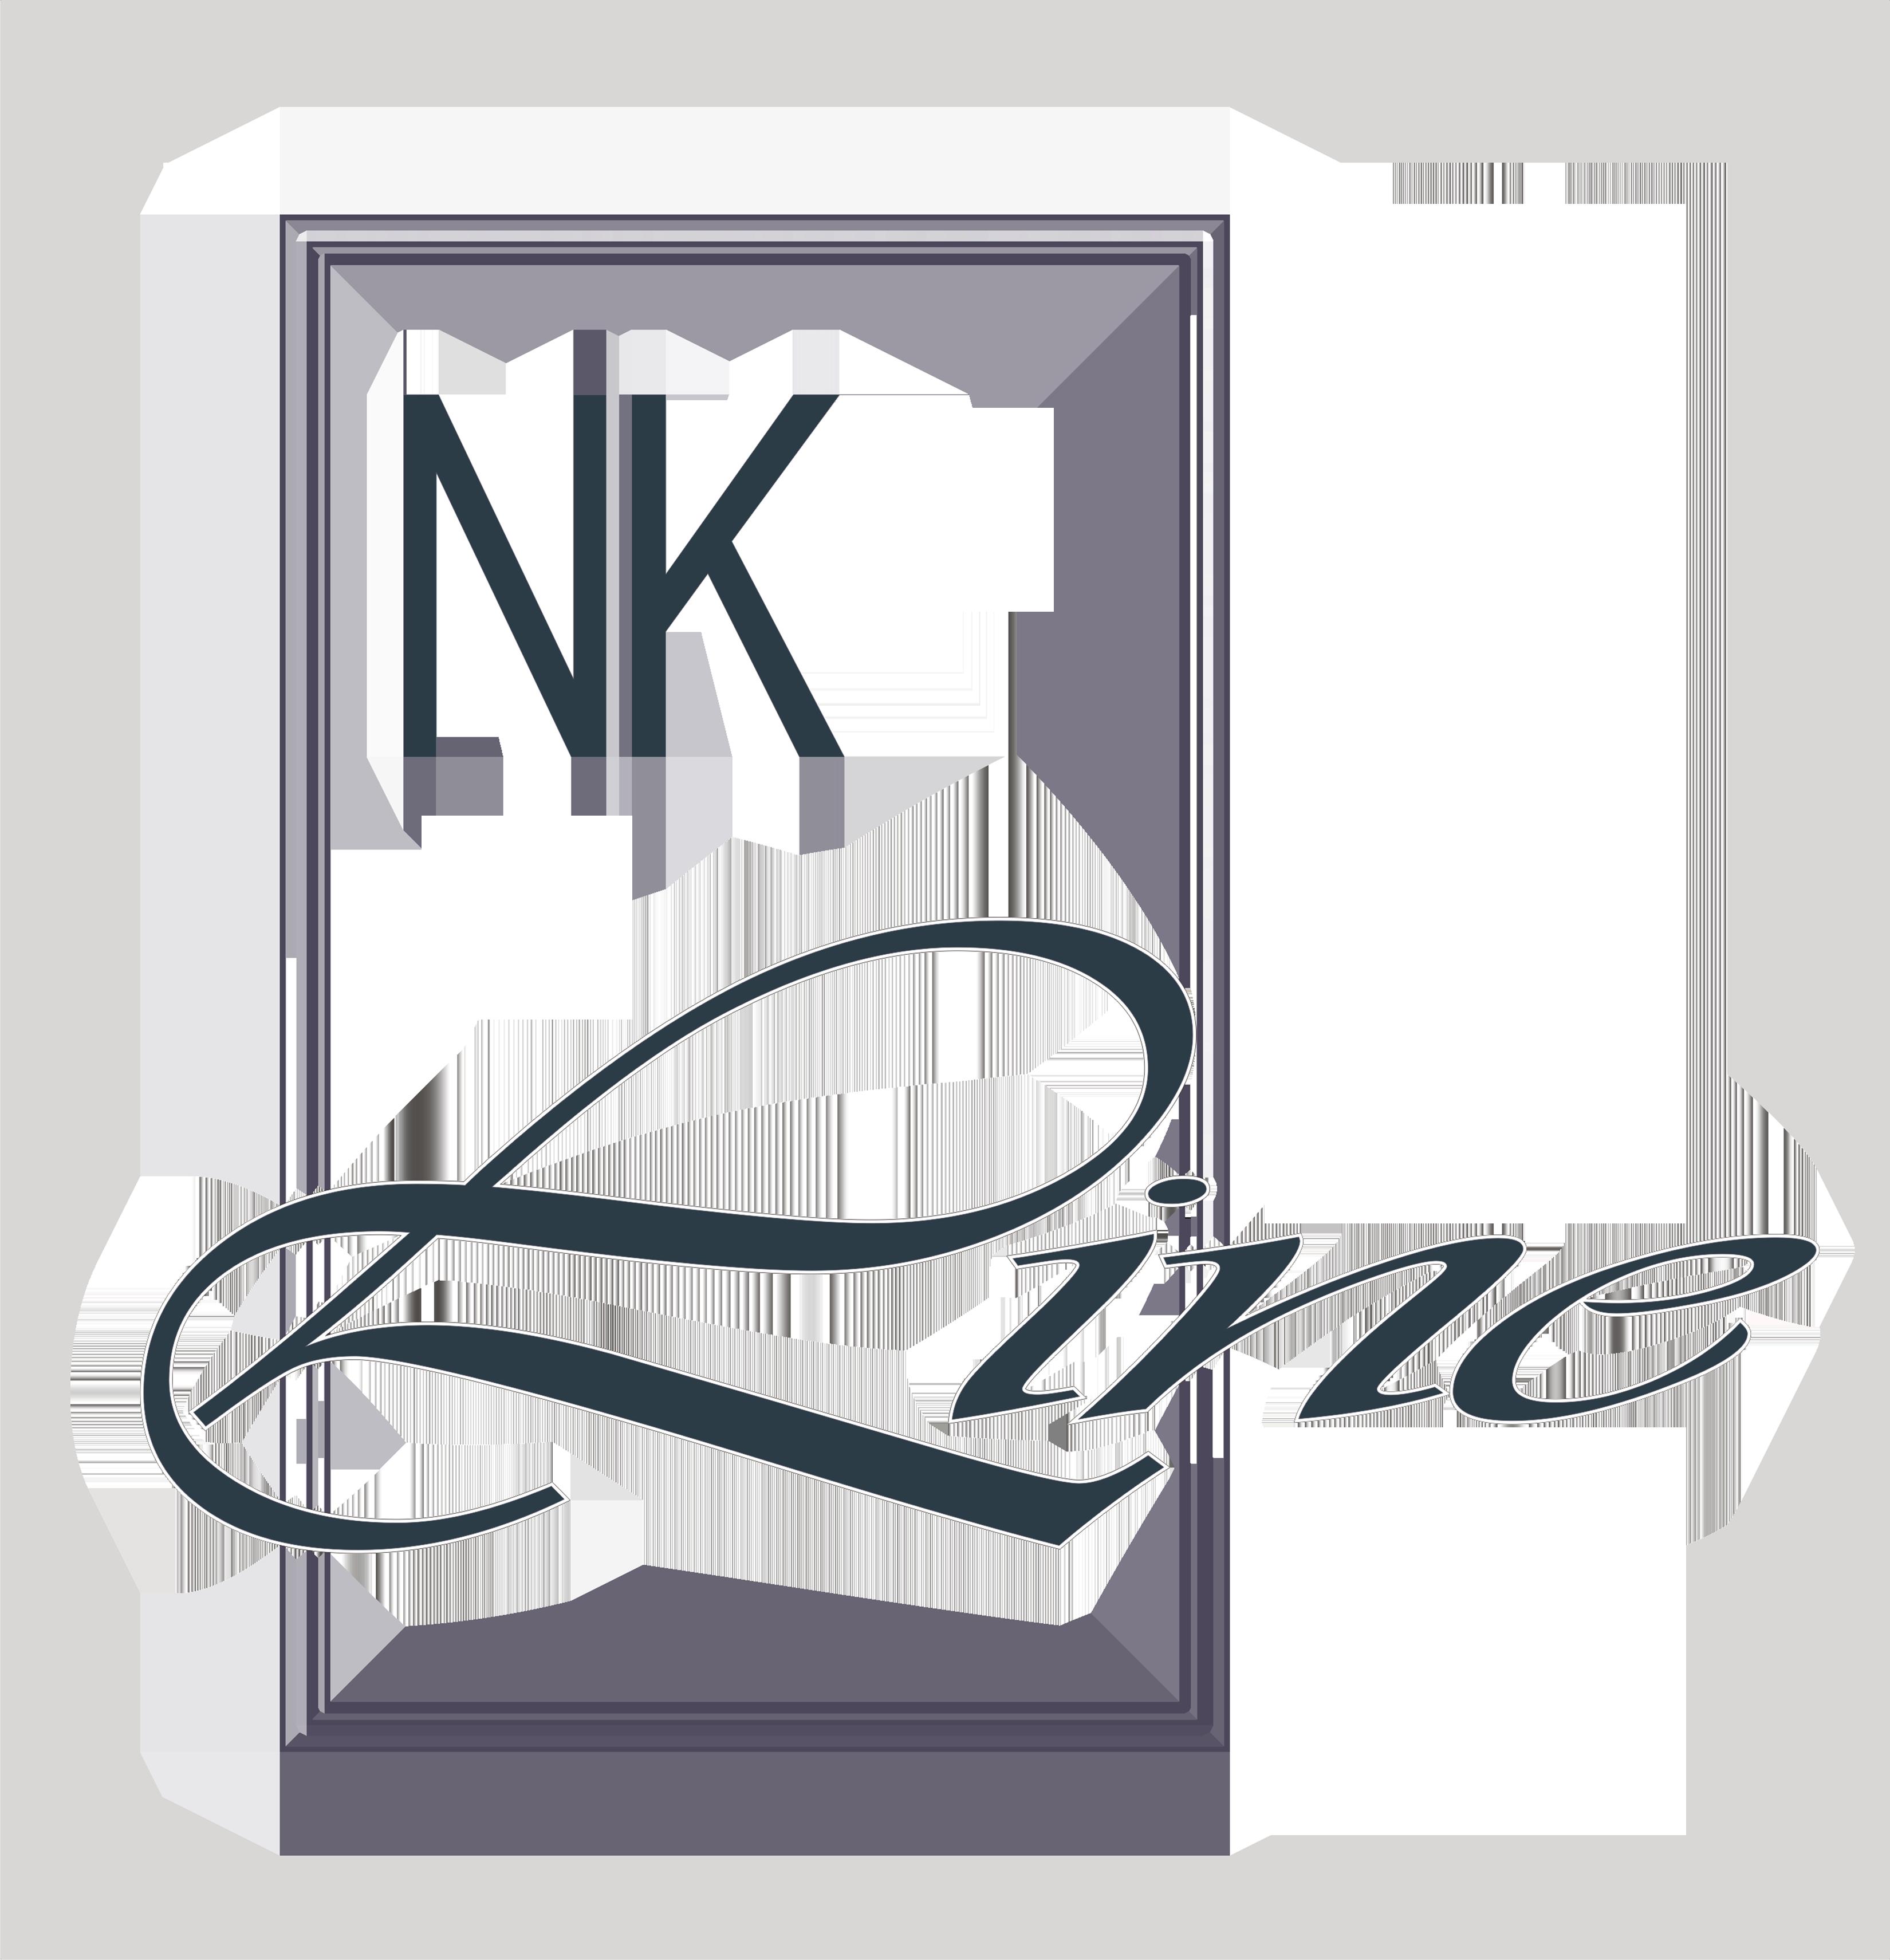 NK-Line